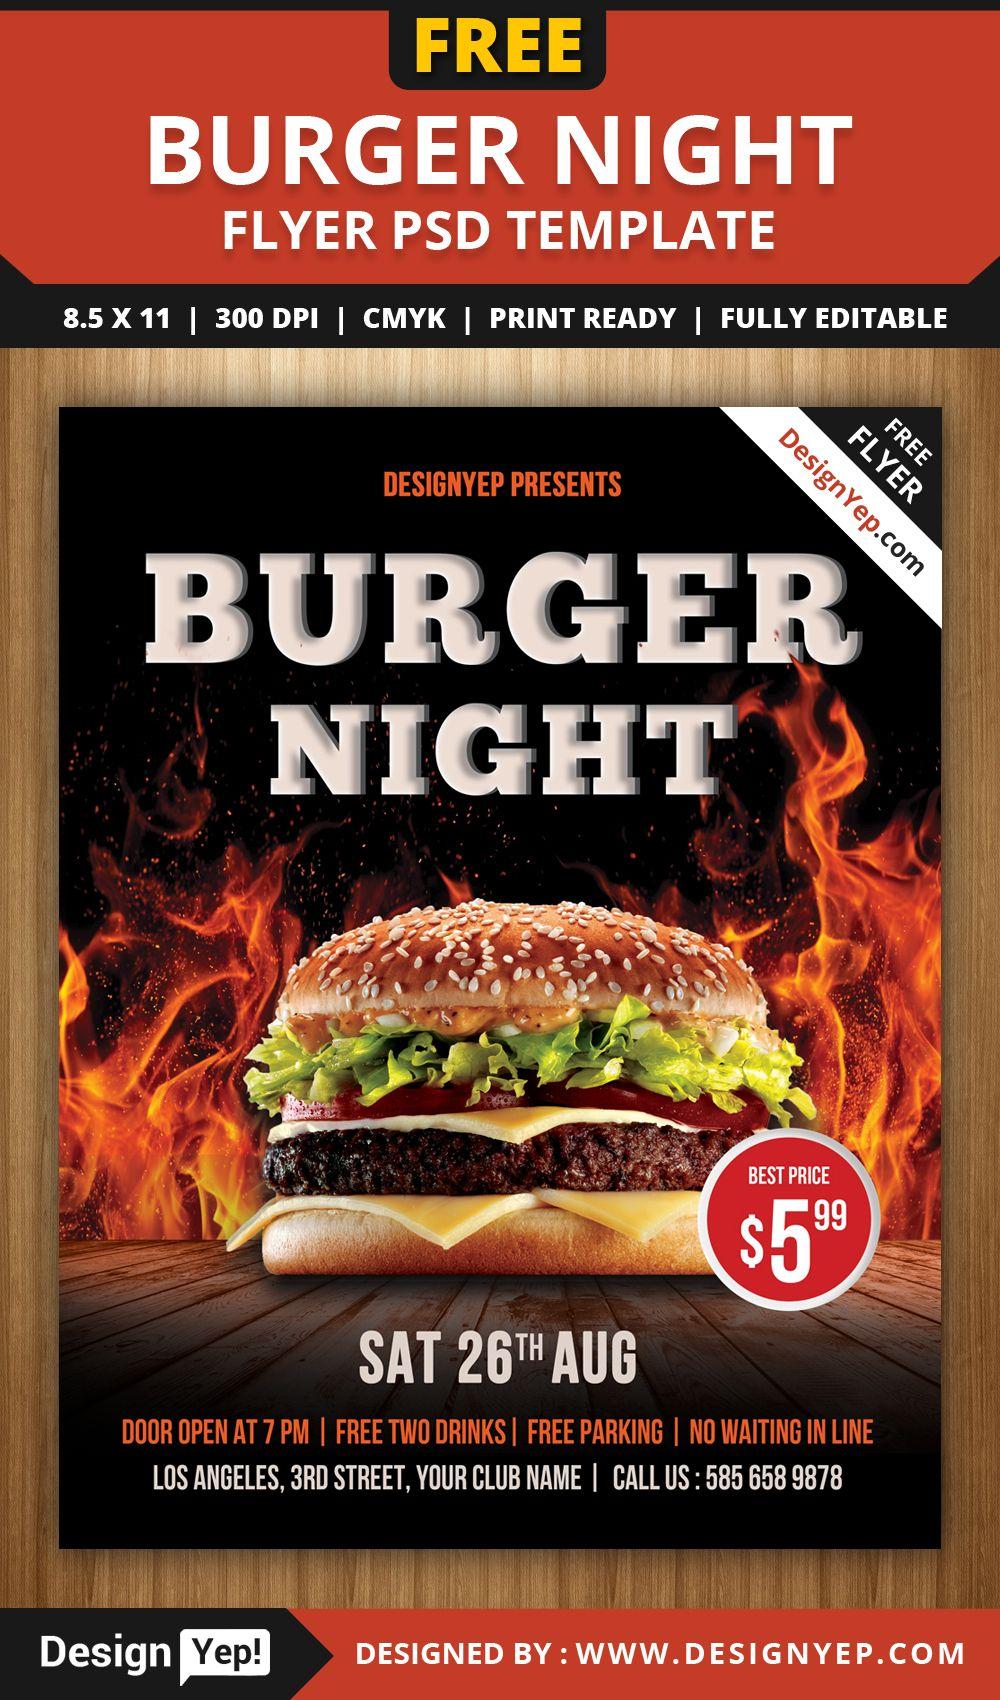 Free-Burger-Night-Flyer-PSD-Template-1234-DesignYep | Free ...